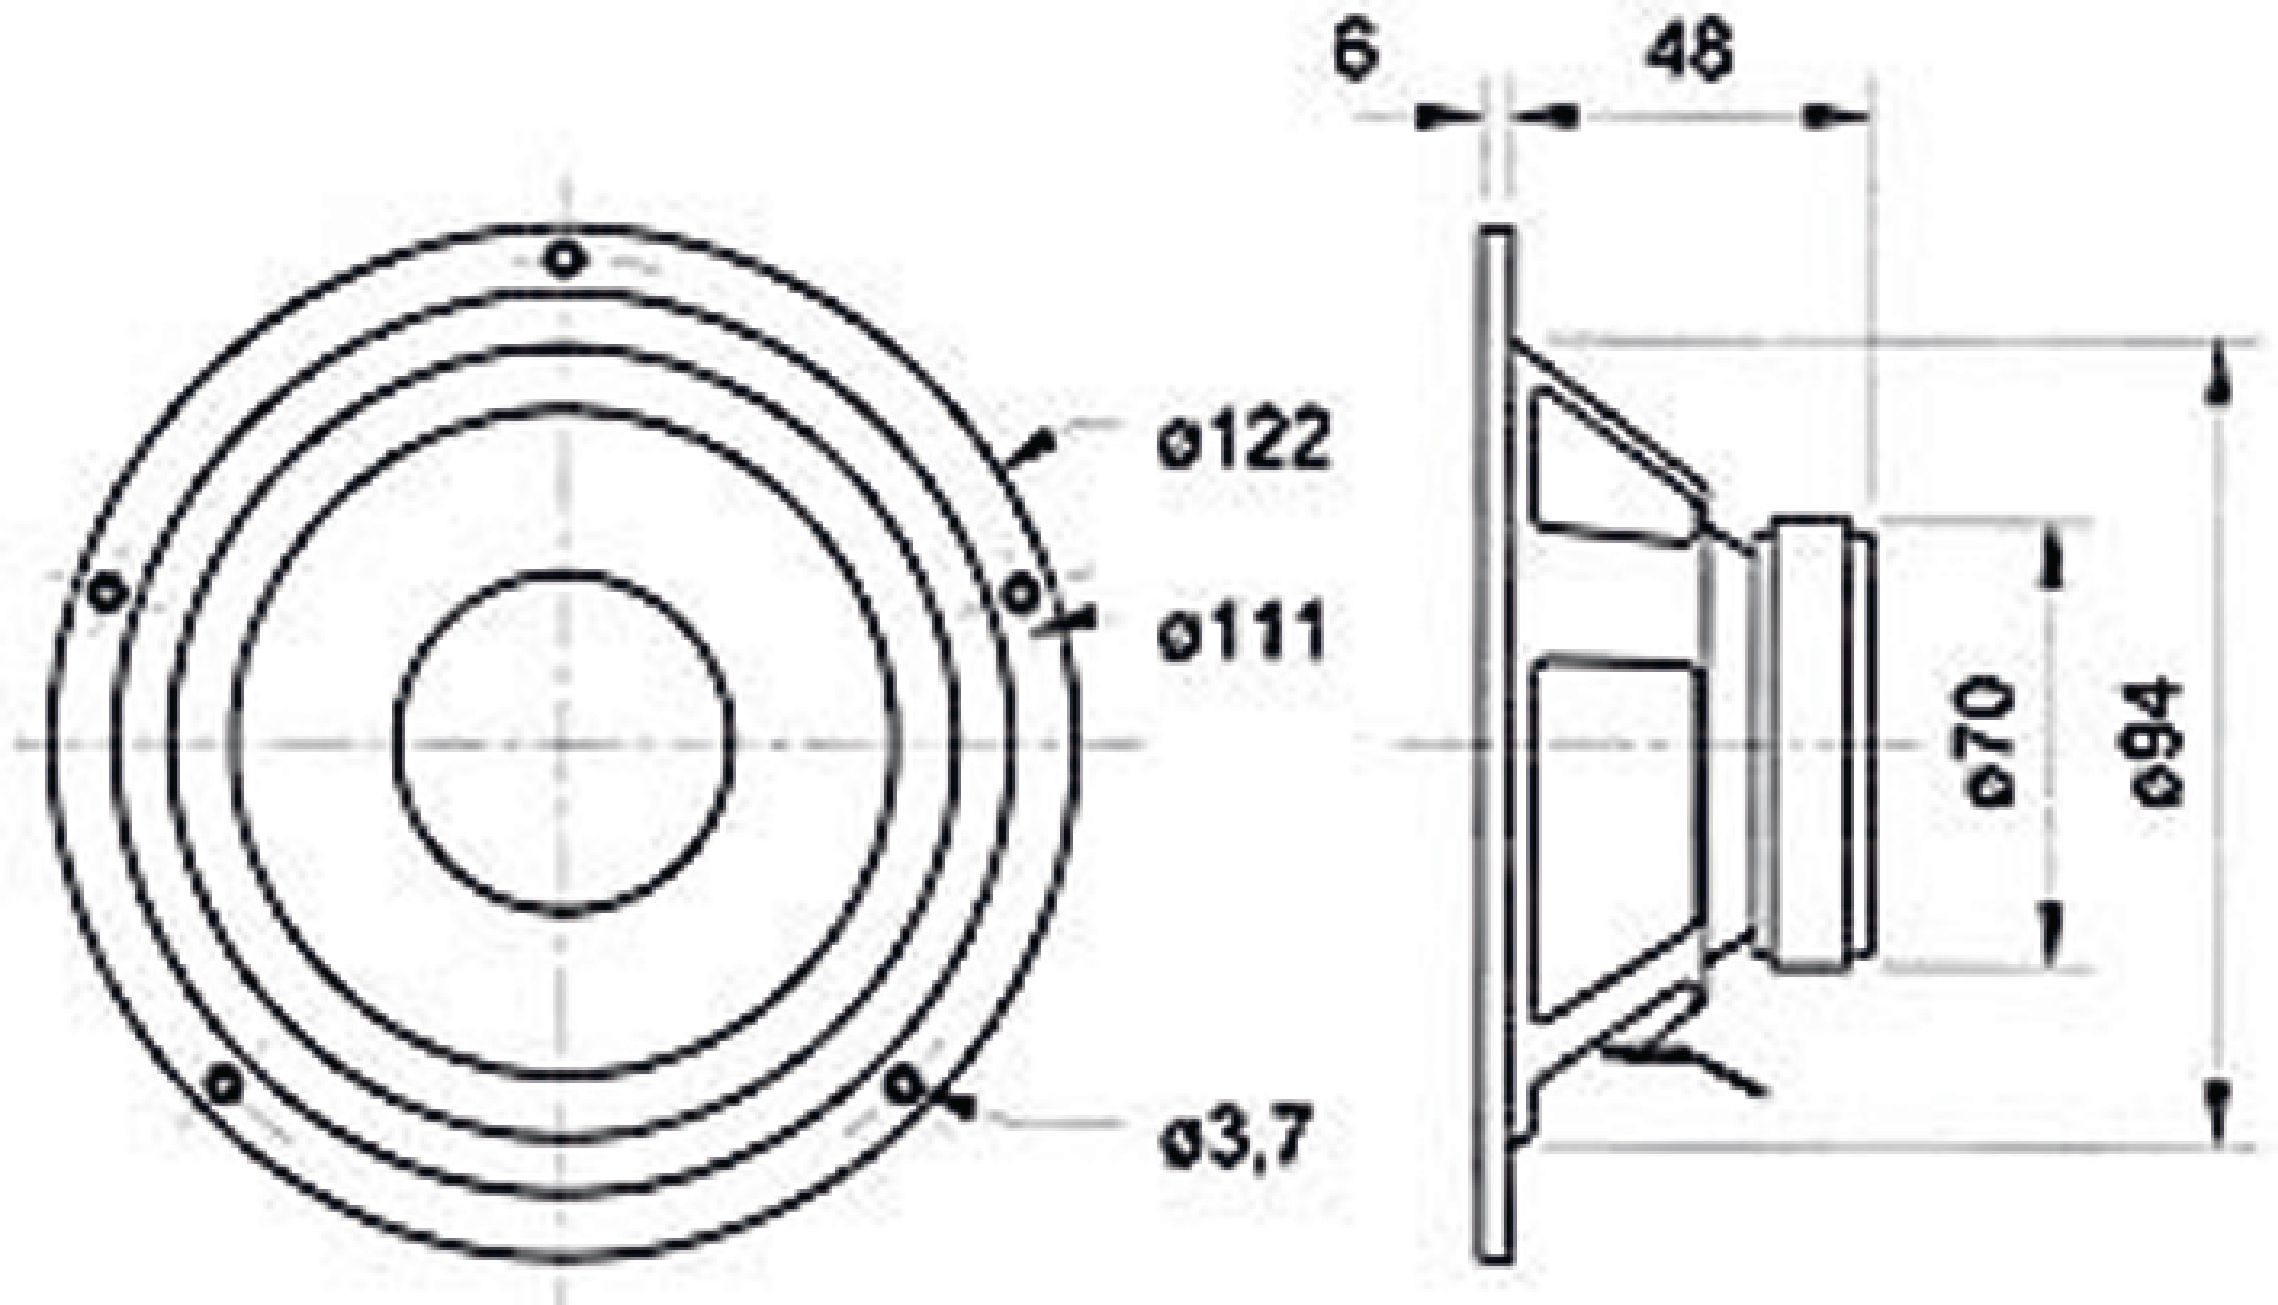 vs-w100s  8 - visaton - midrange speaker 10 cm  4 u0026quot   8 ohm